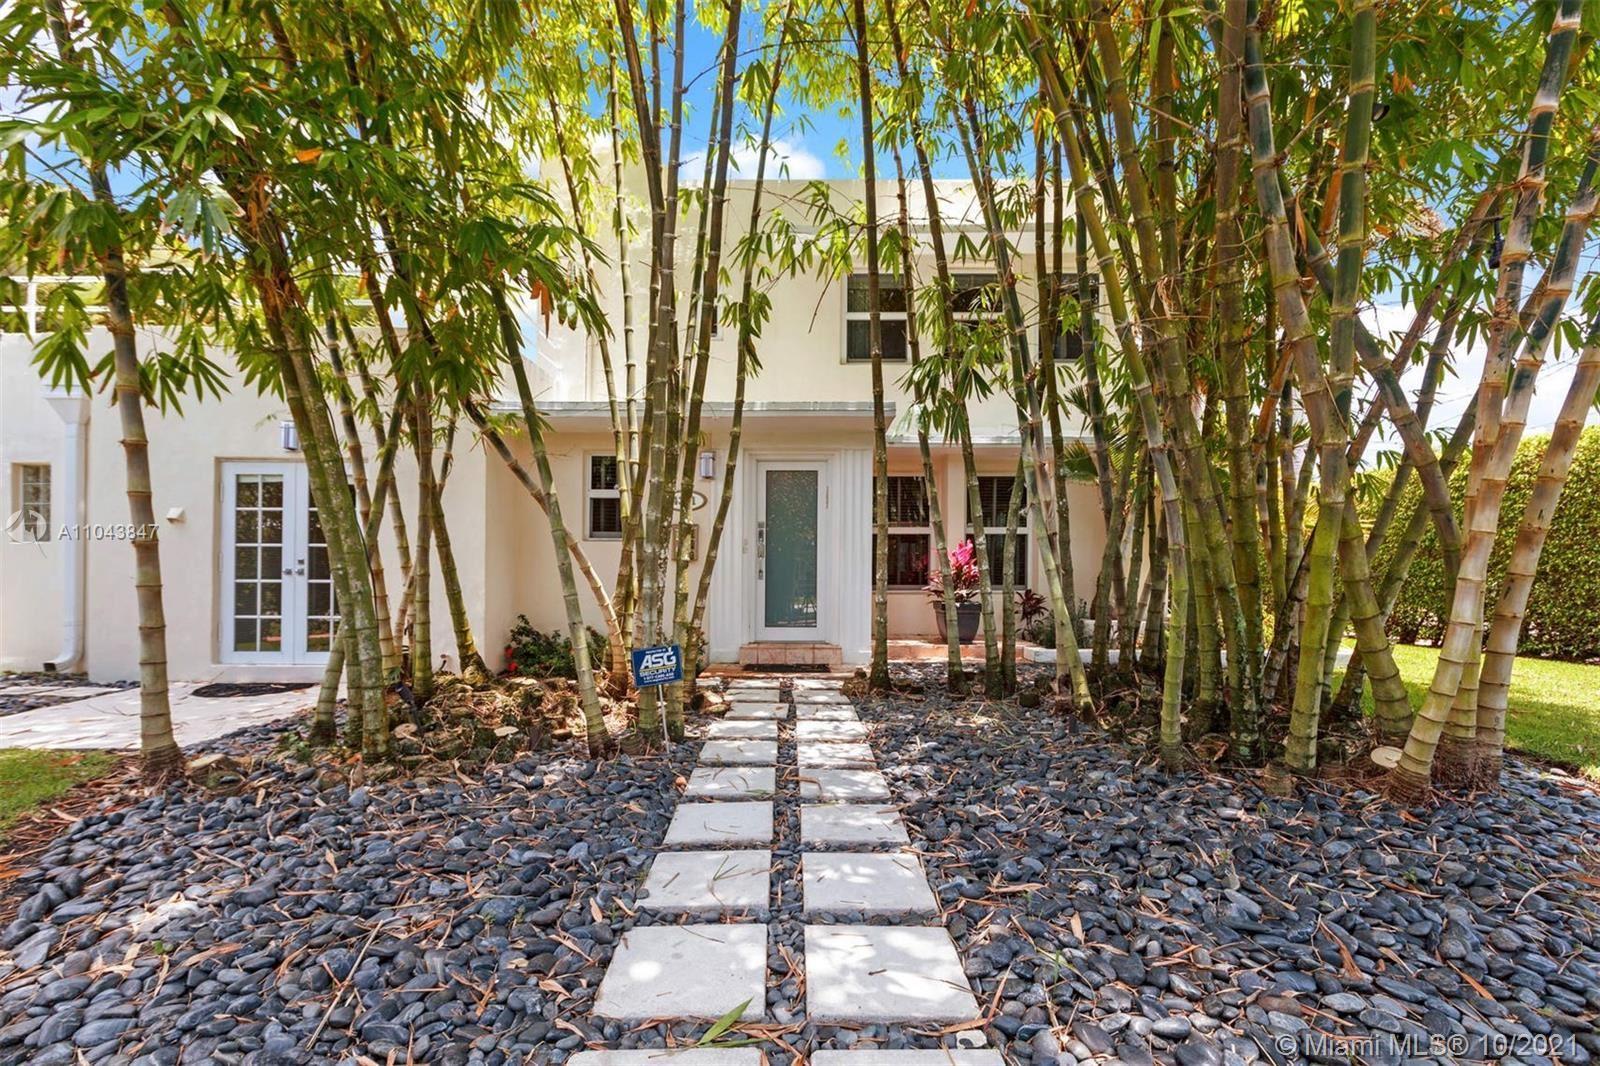 4301 Royal Palm Ave, Miami Beach, FL 33140 - #: A11043847